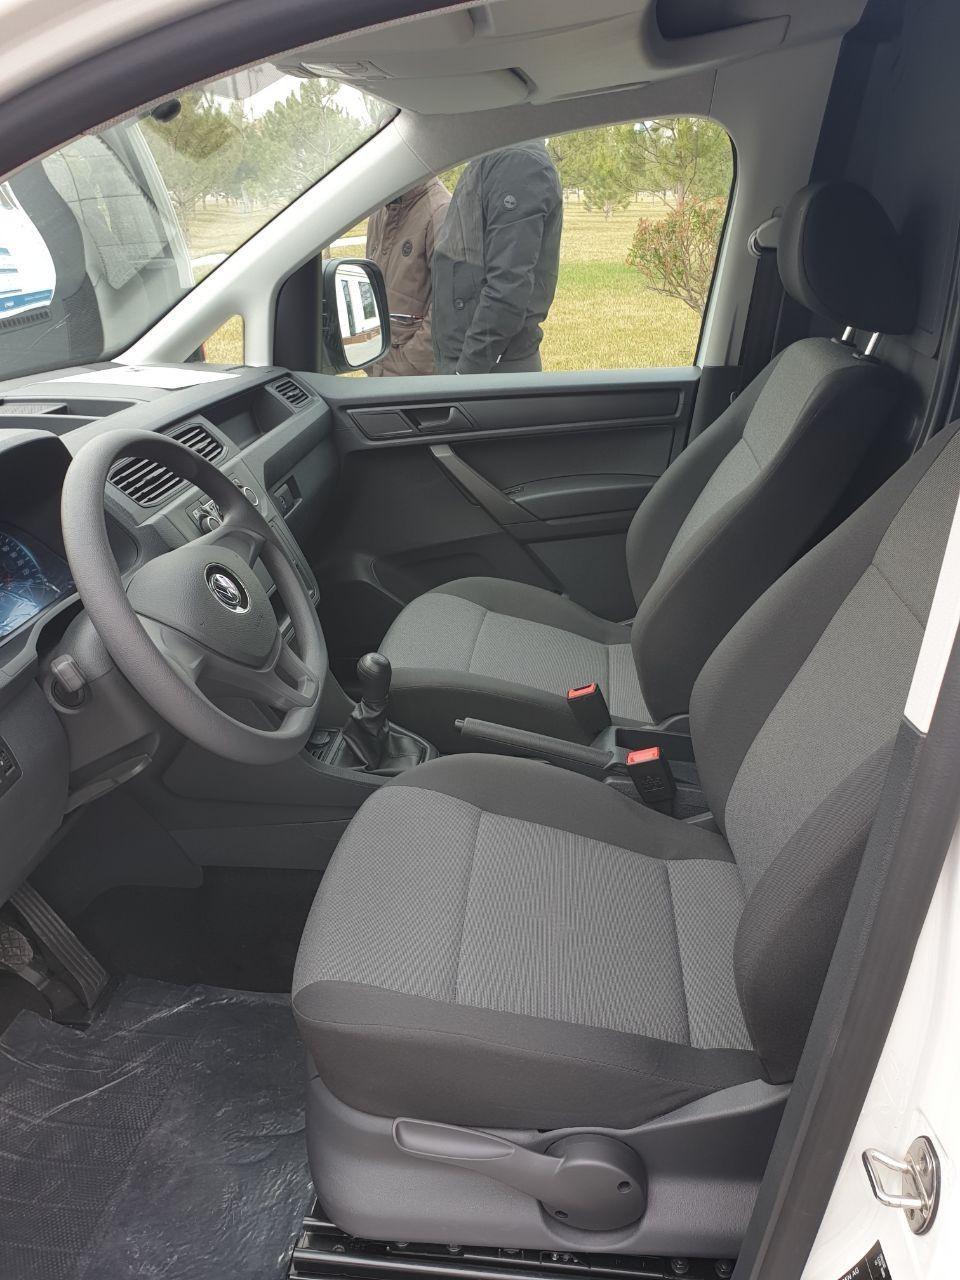 Volkswagen Caddy Narxi - Цена на Кэдди в Узбекистане - 10